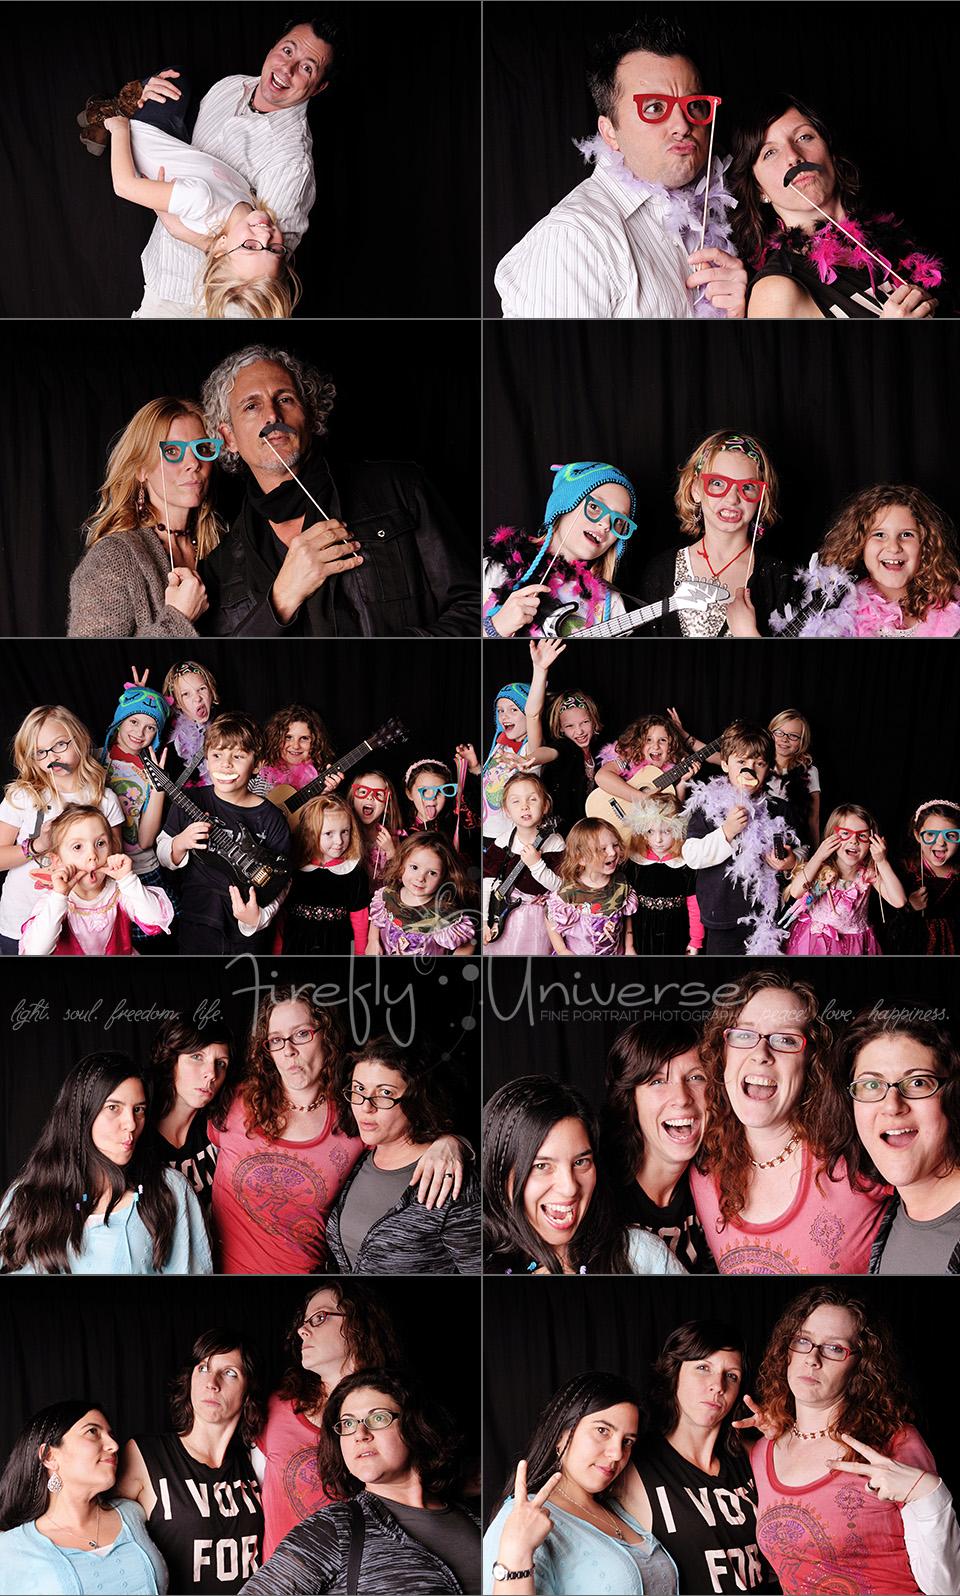 HanukkahBlog2St. Louis Children's Photographer, St. Louis Children's Photography, Children's Portraiture, Children's Portrait Photography, St. Louis Child Photographer, St. Louis Photo Booth, Photo Booth Pictures, St. Louis Family Photographer